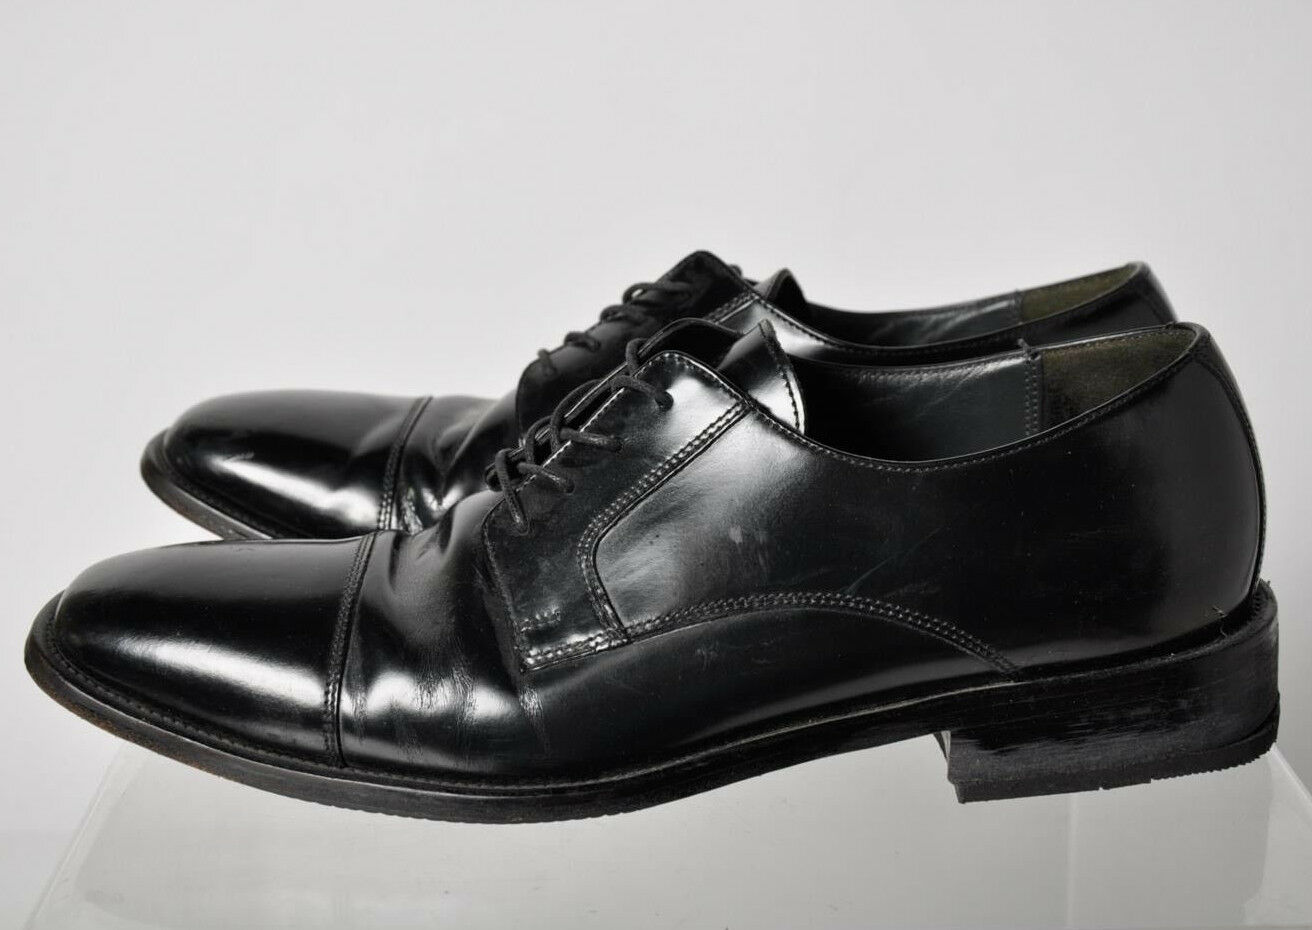 Bostonian Men's Black Leather Cap-Toe Oxford Lace-Up Dress shoes Size 10.5